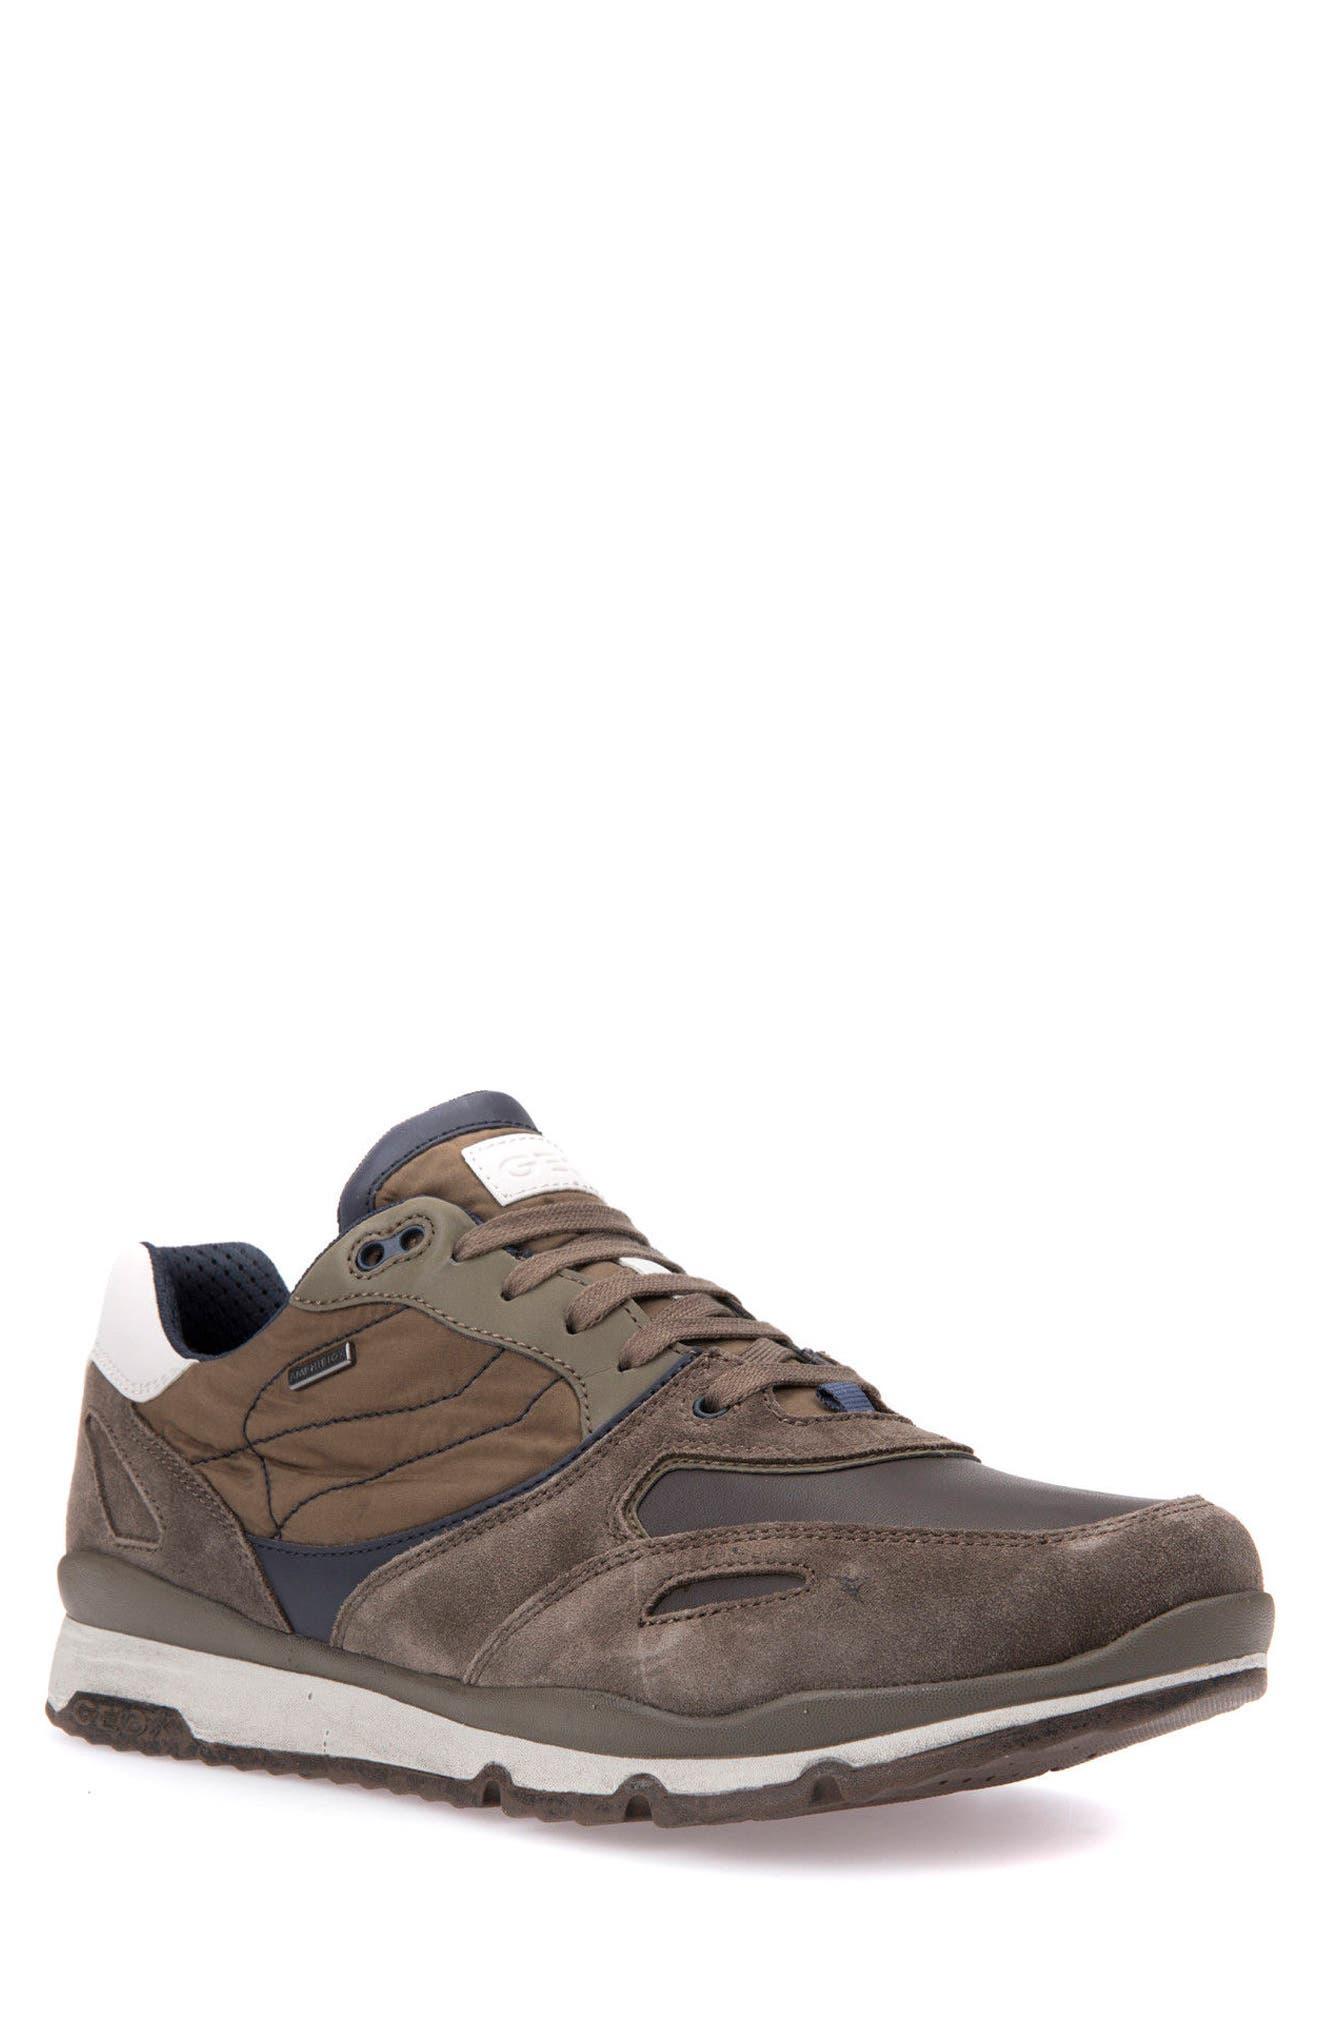 Sandro ABX Ambphibiox Waterproof Sneaker,                         Main,                         color, Taupe